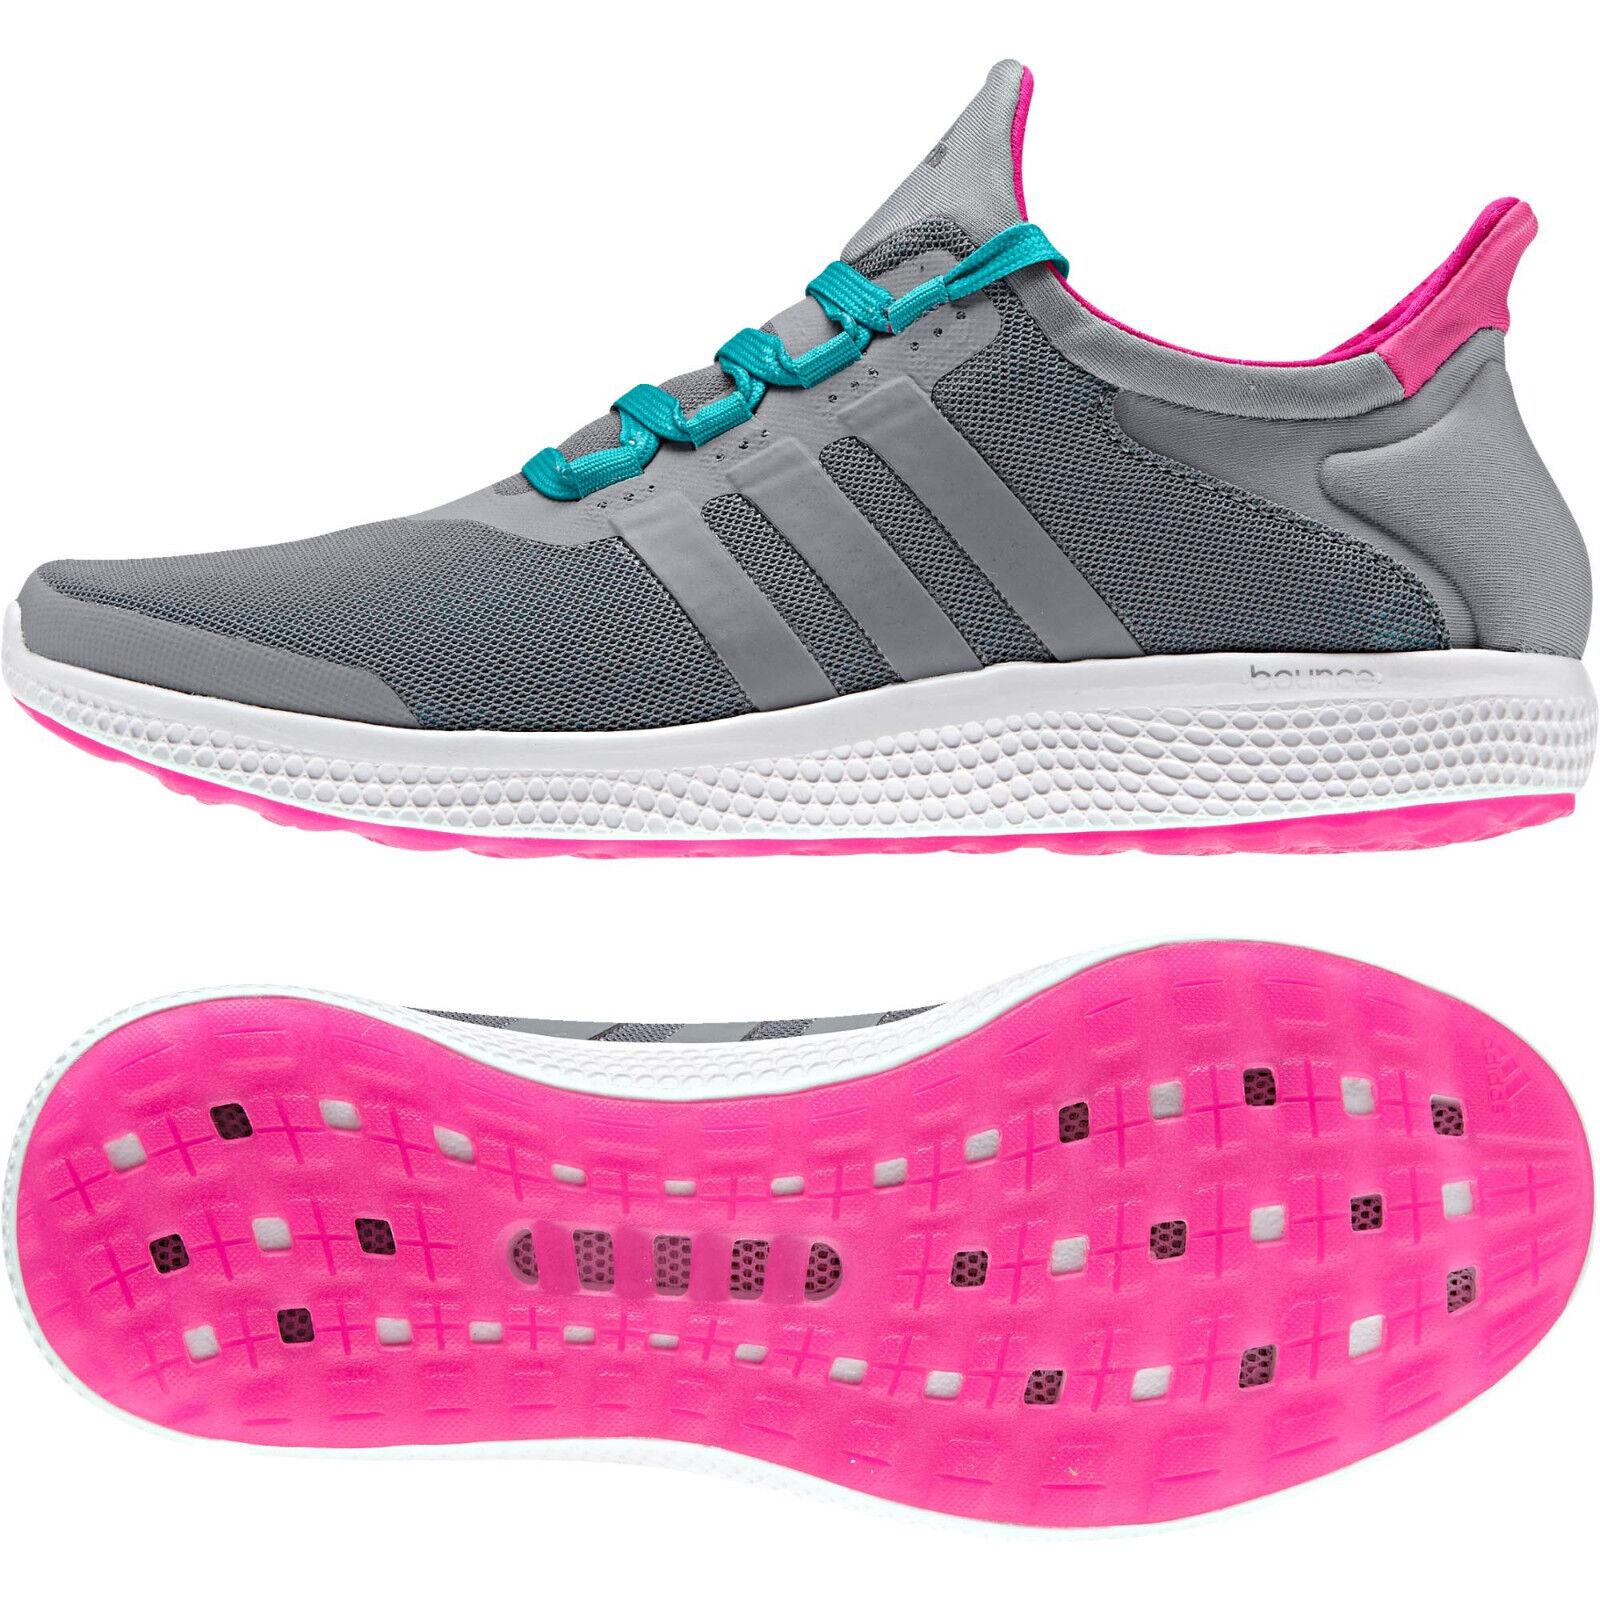 Adidas Performance CC Gr. Sonic W, grau-kombi ; Gr. CC 40 ; US 8 ; UK 6,5 ; NEU 4c2b75